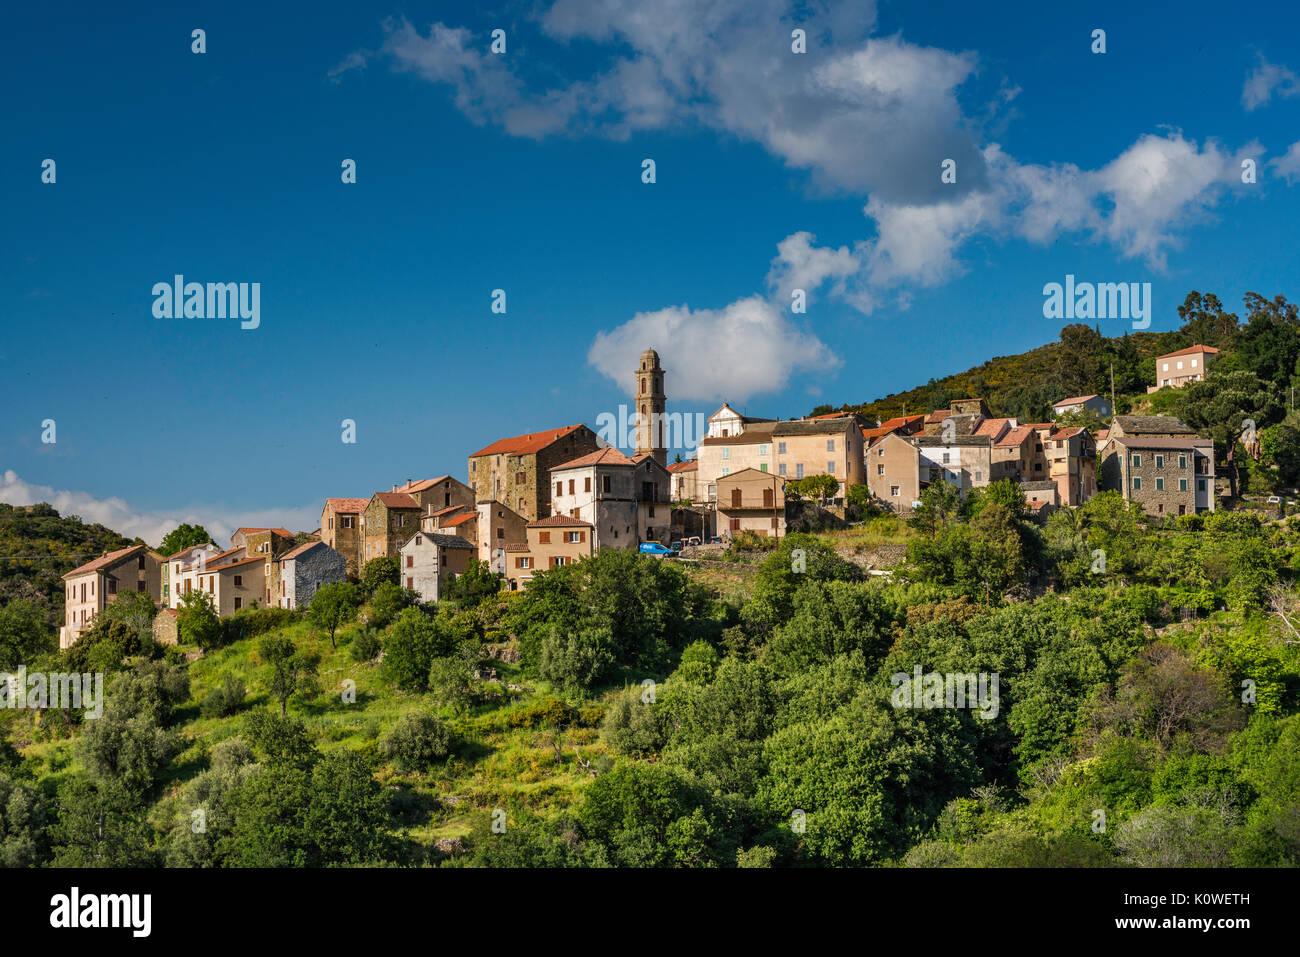 Hill town of Pieve, Nebbio region, Haute-Corse department, Corsica, France - Stock Image